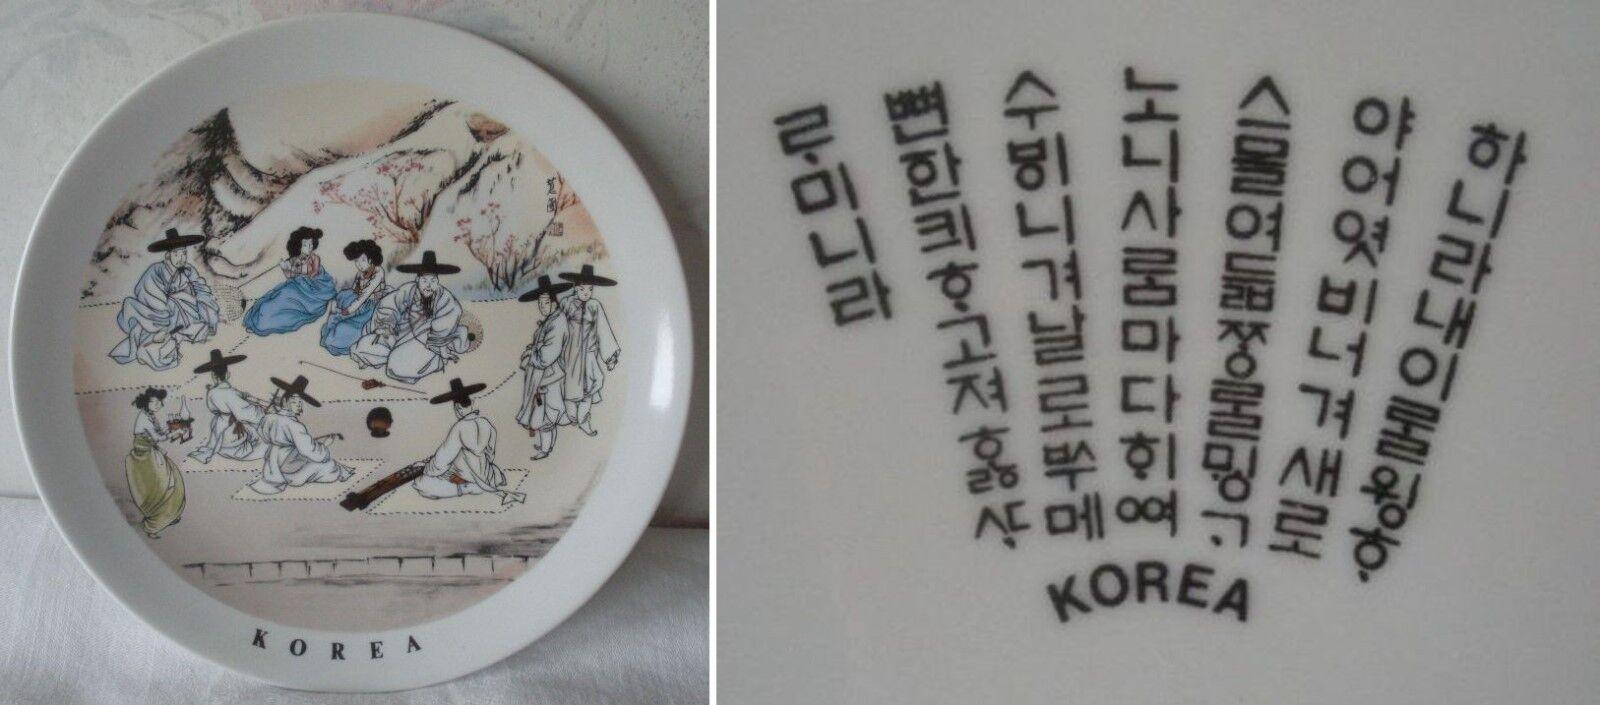 Decorative KOREA Plate Made in Korea Traditional Korean Clothing Men Women Image